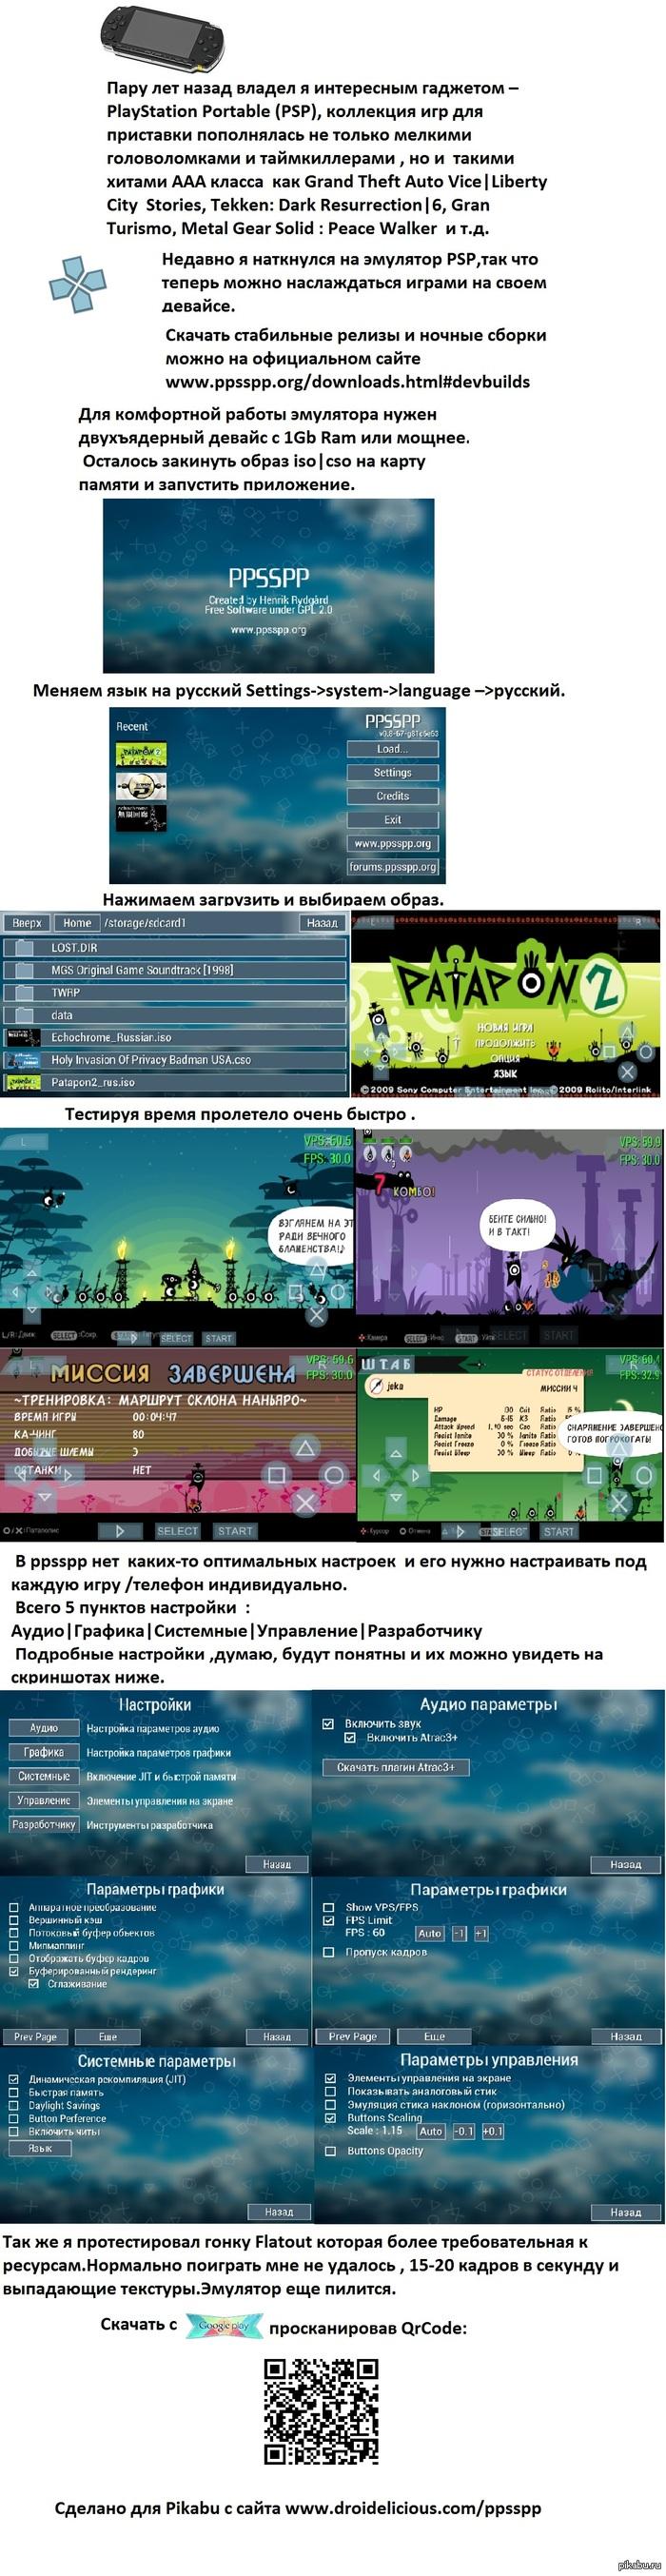 Psp игры на андроиде